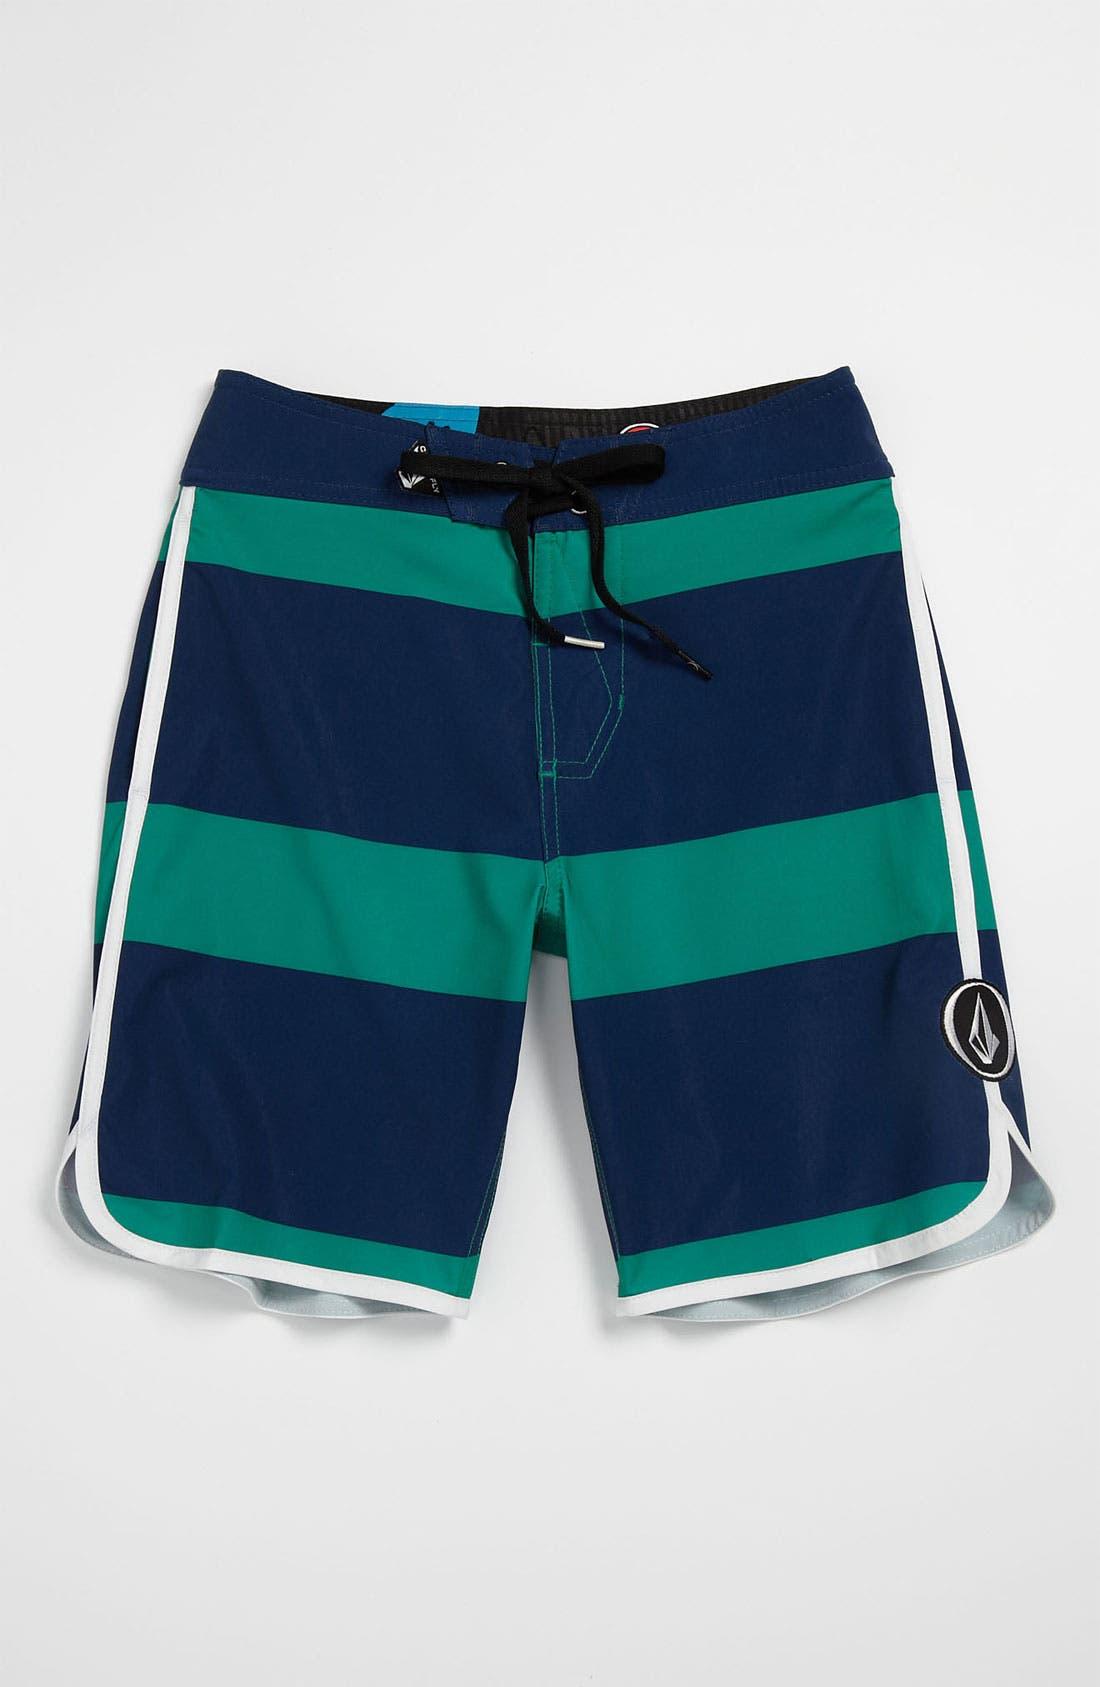 Alternate Image 1 Selected - Volcom 'Scallop' Board Shorts (Big Boys)